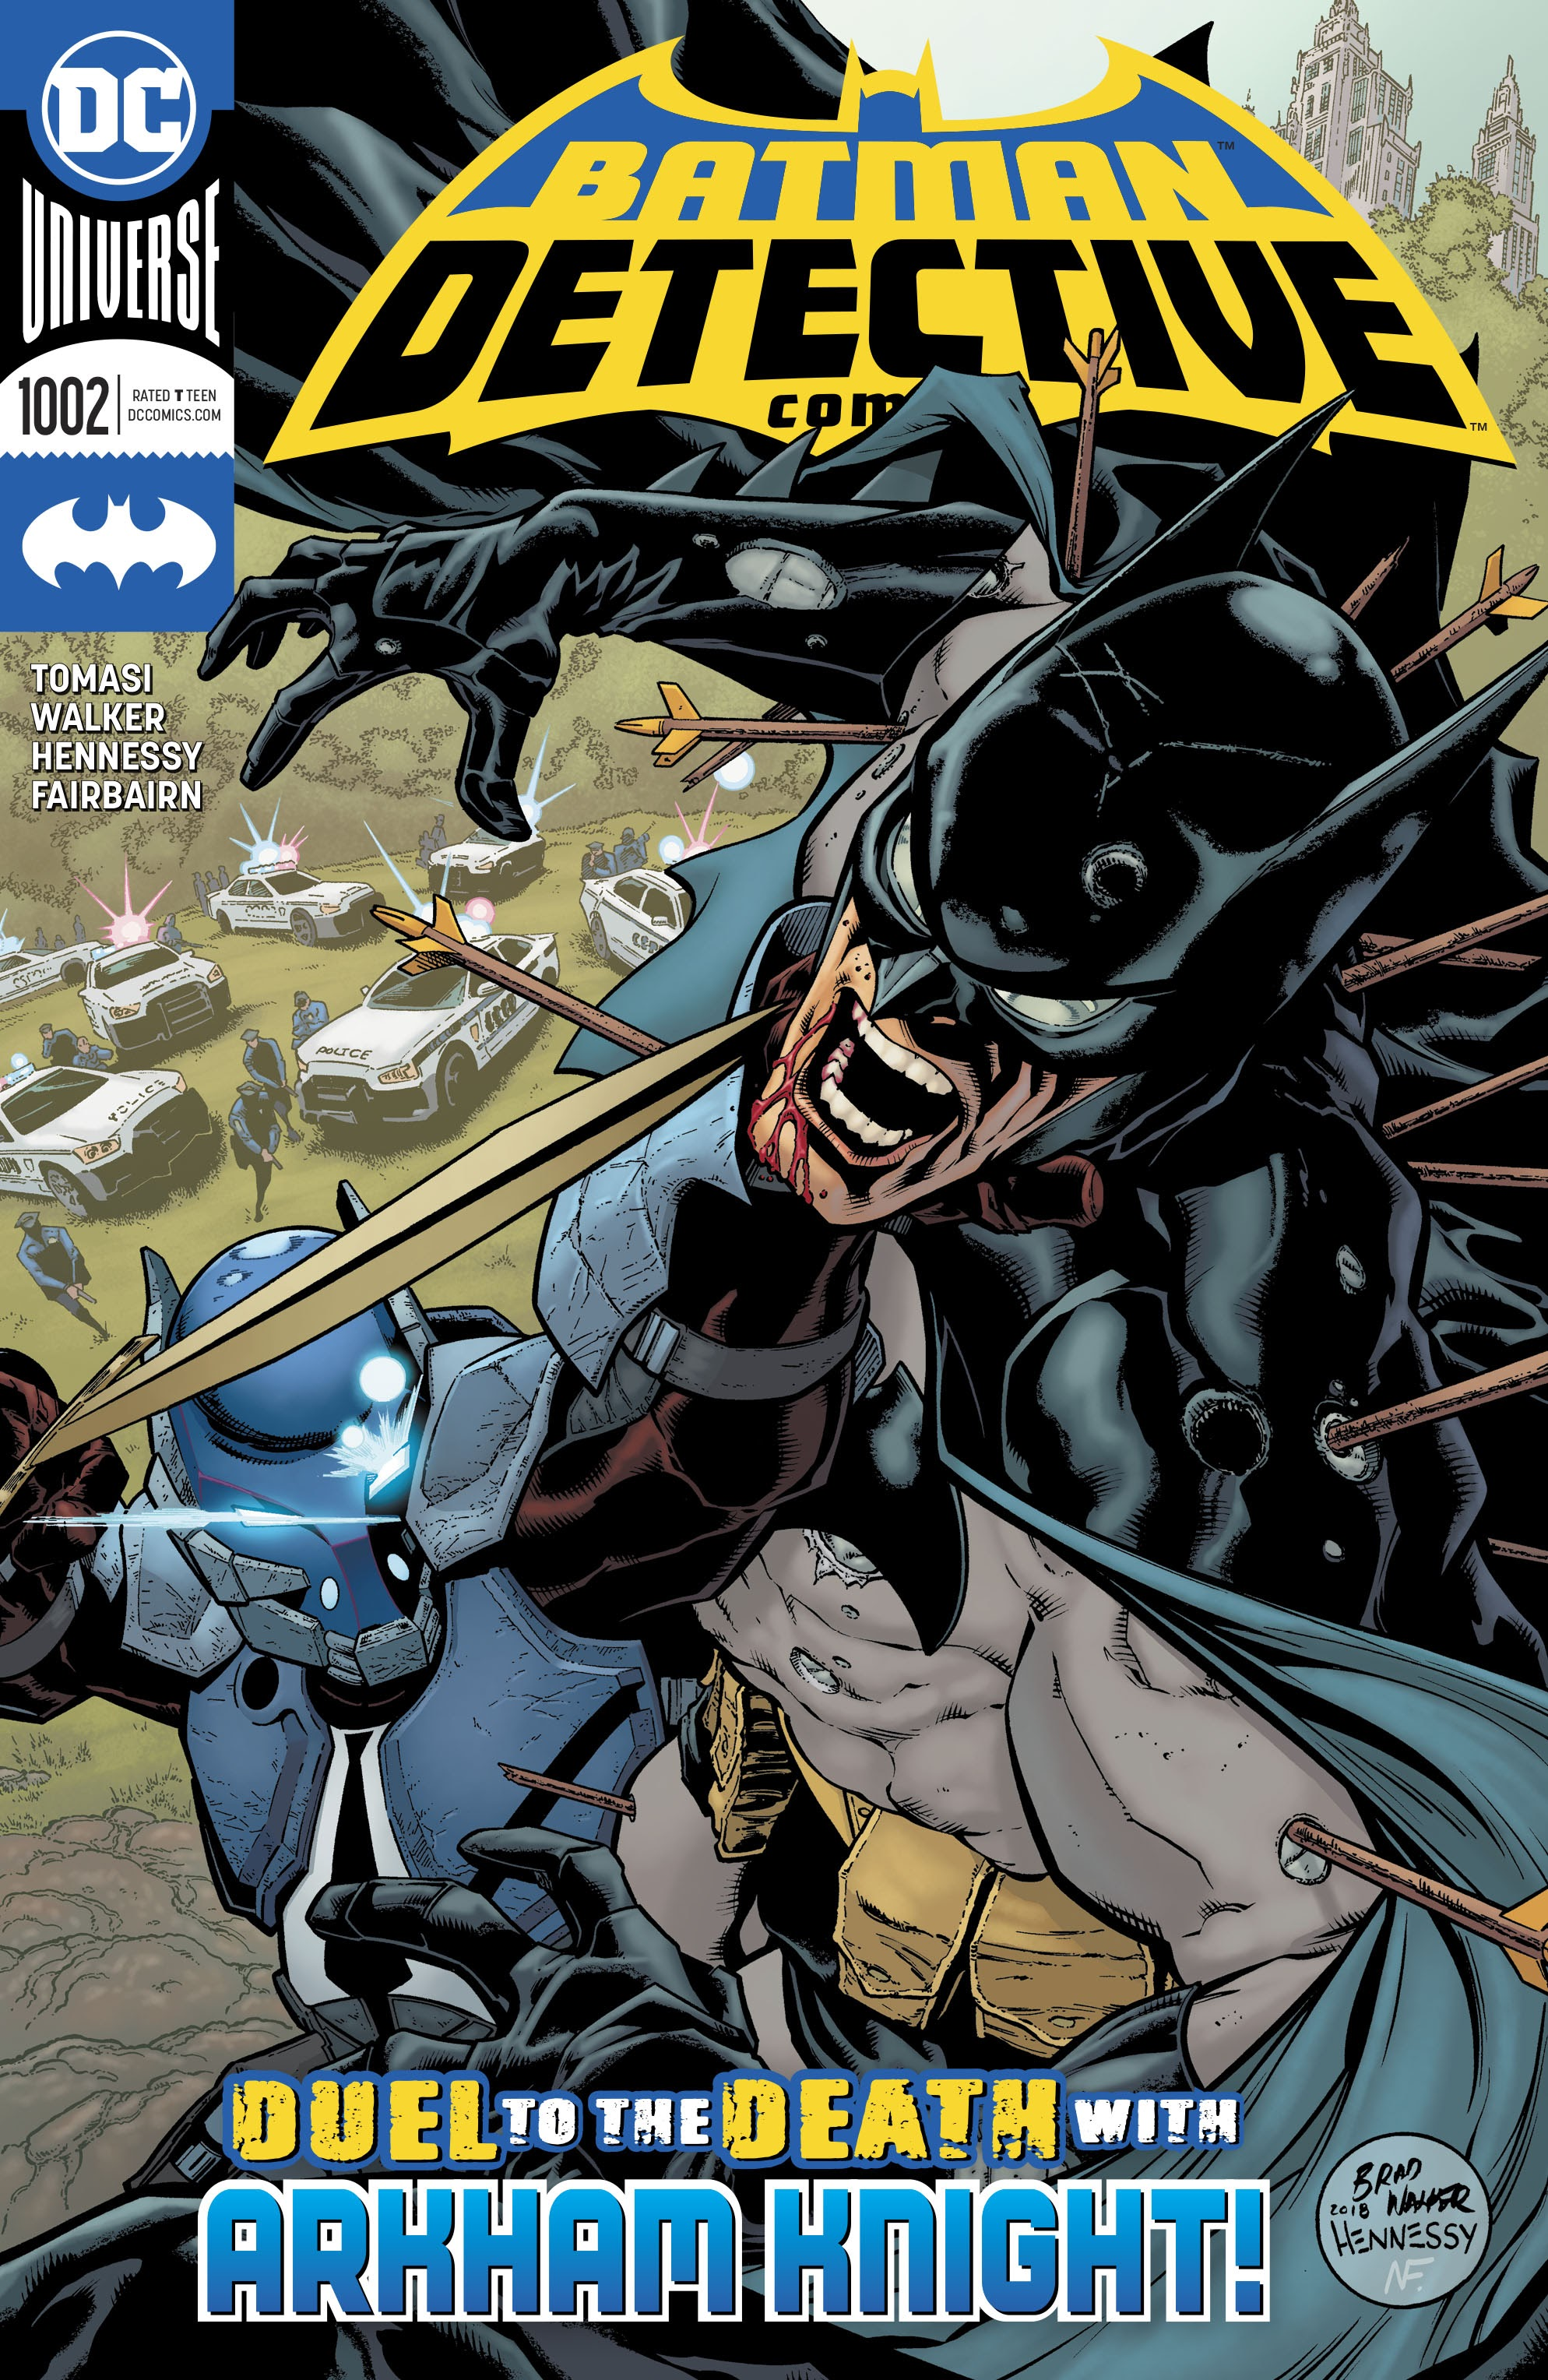 Detective Comics (2016) 1002 Page 1